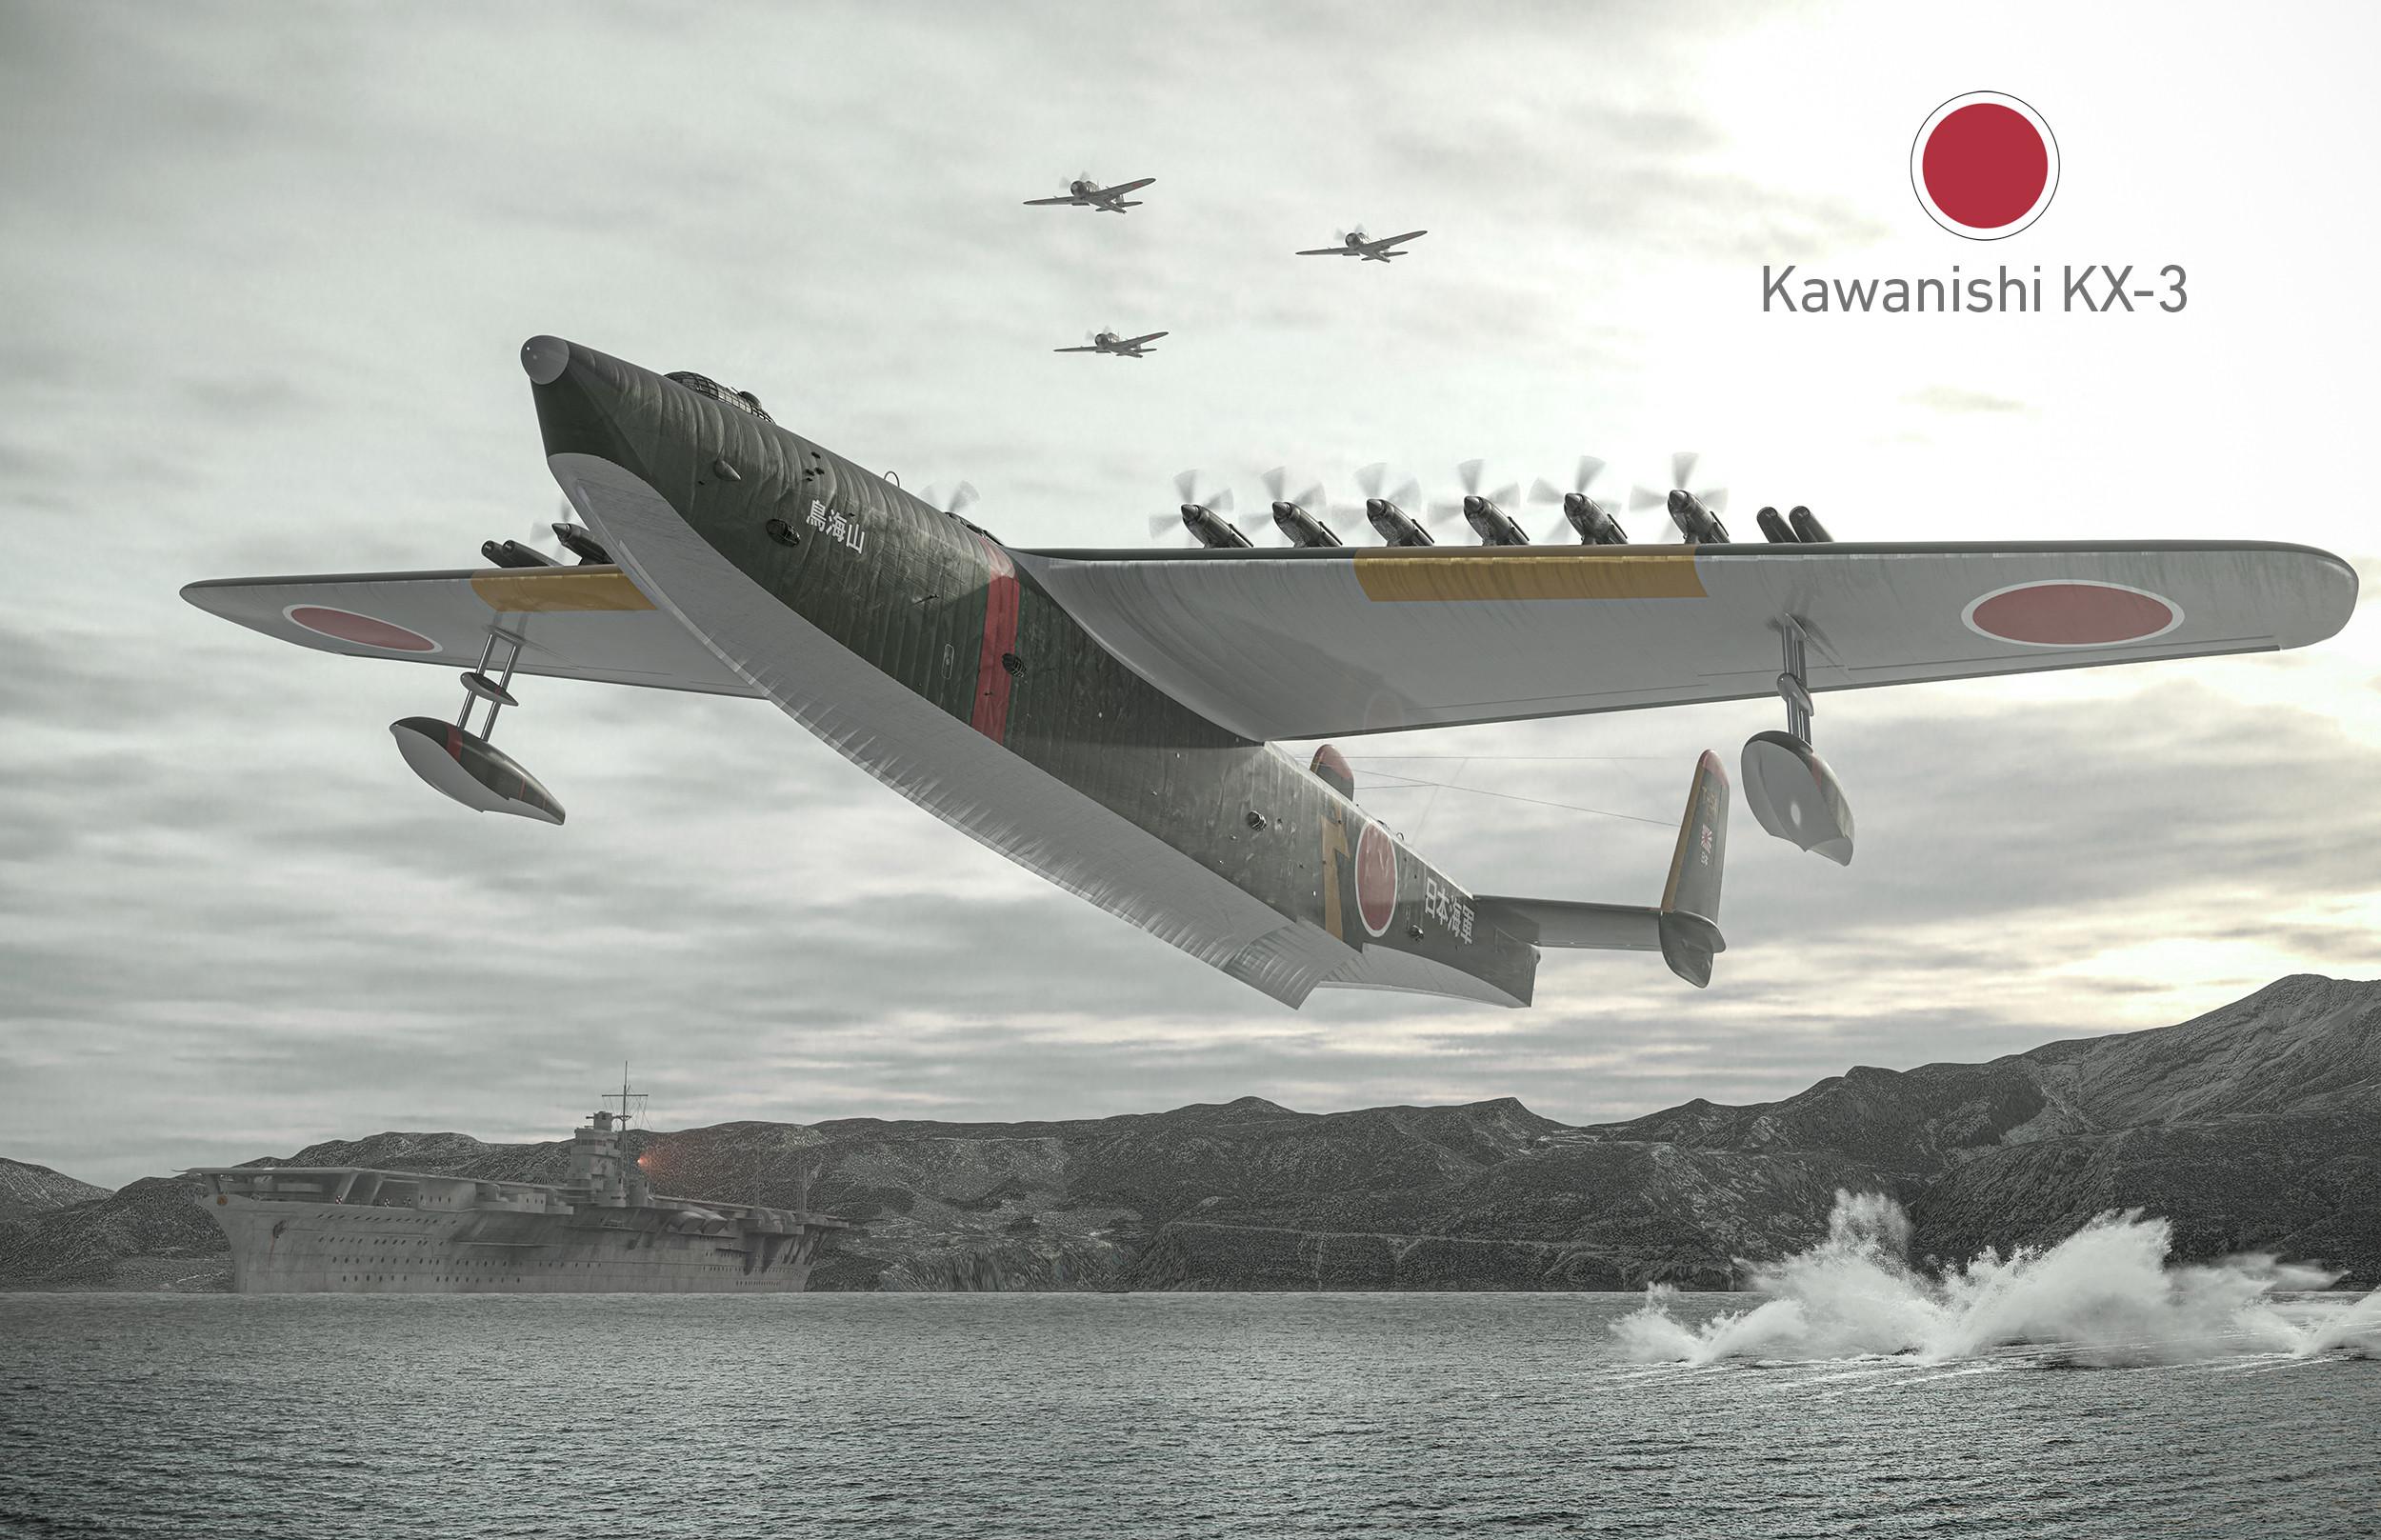 Kawanishi KX-3